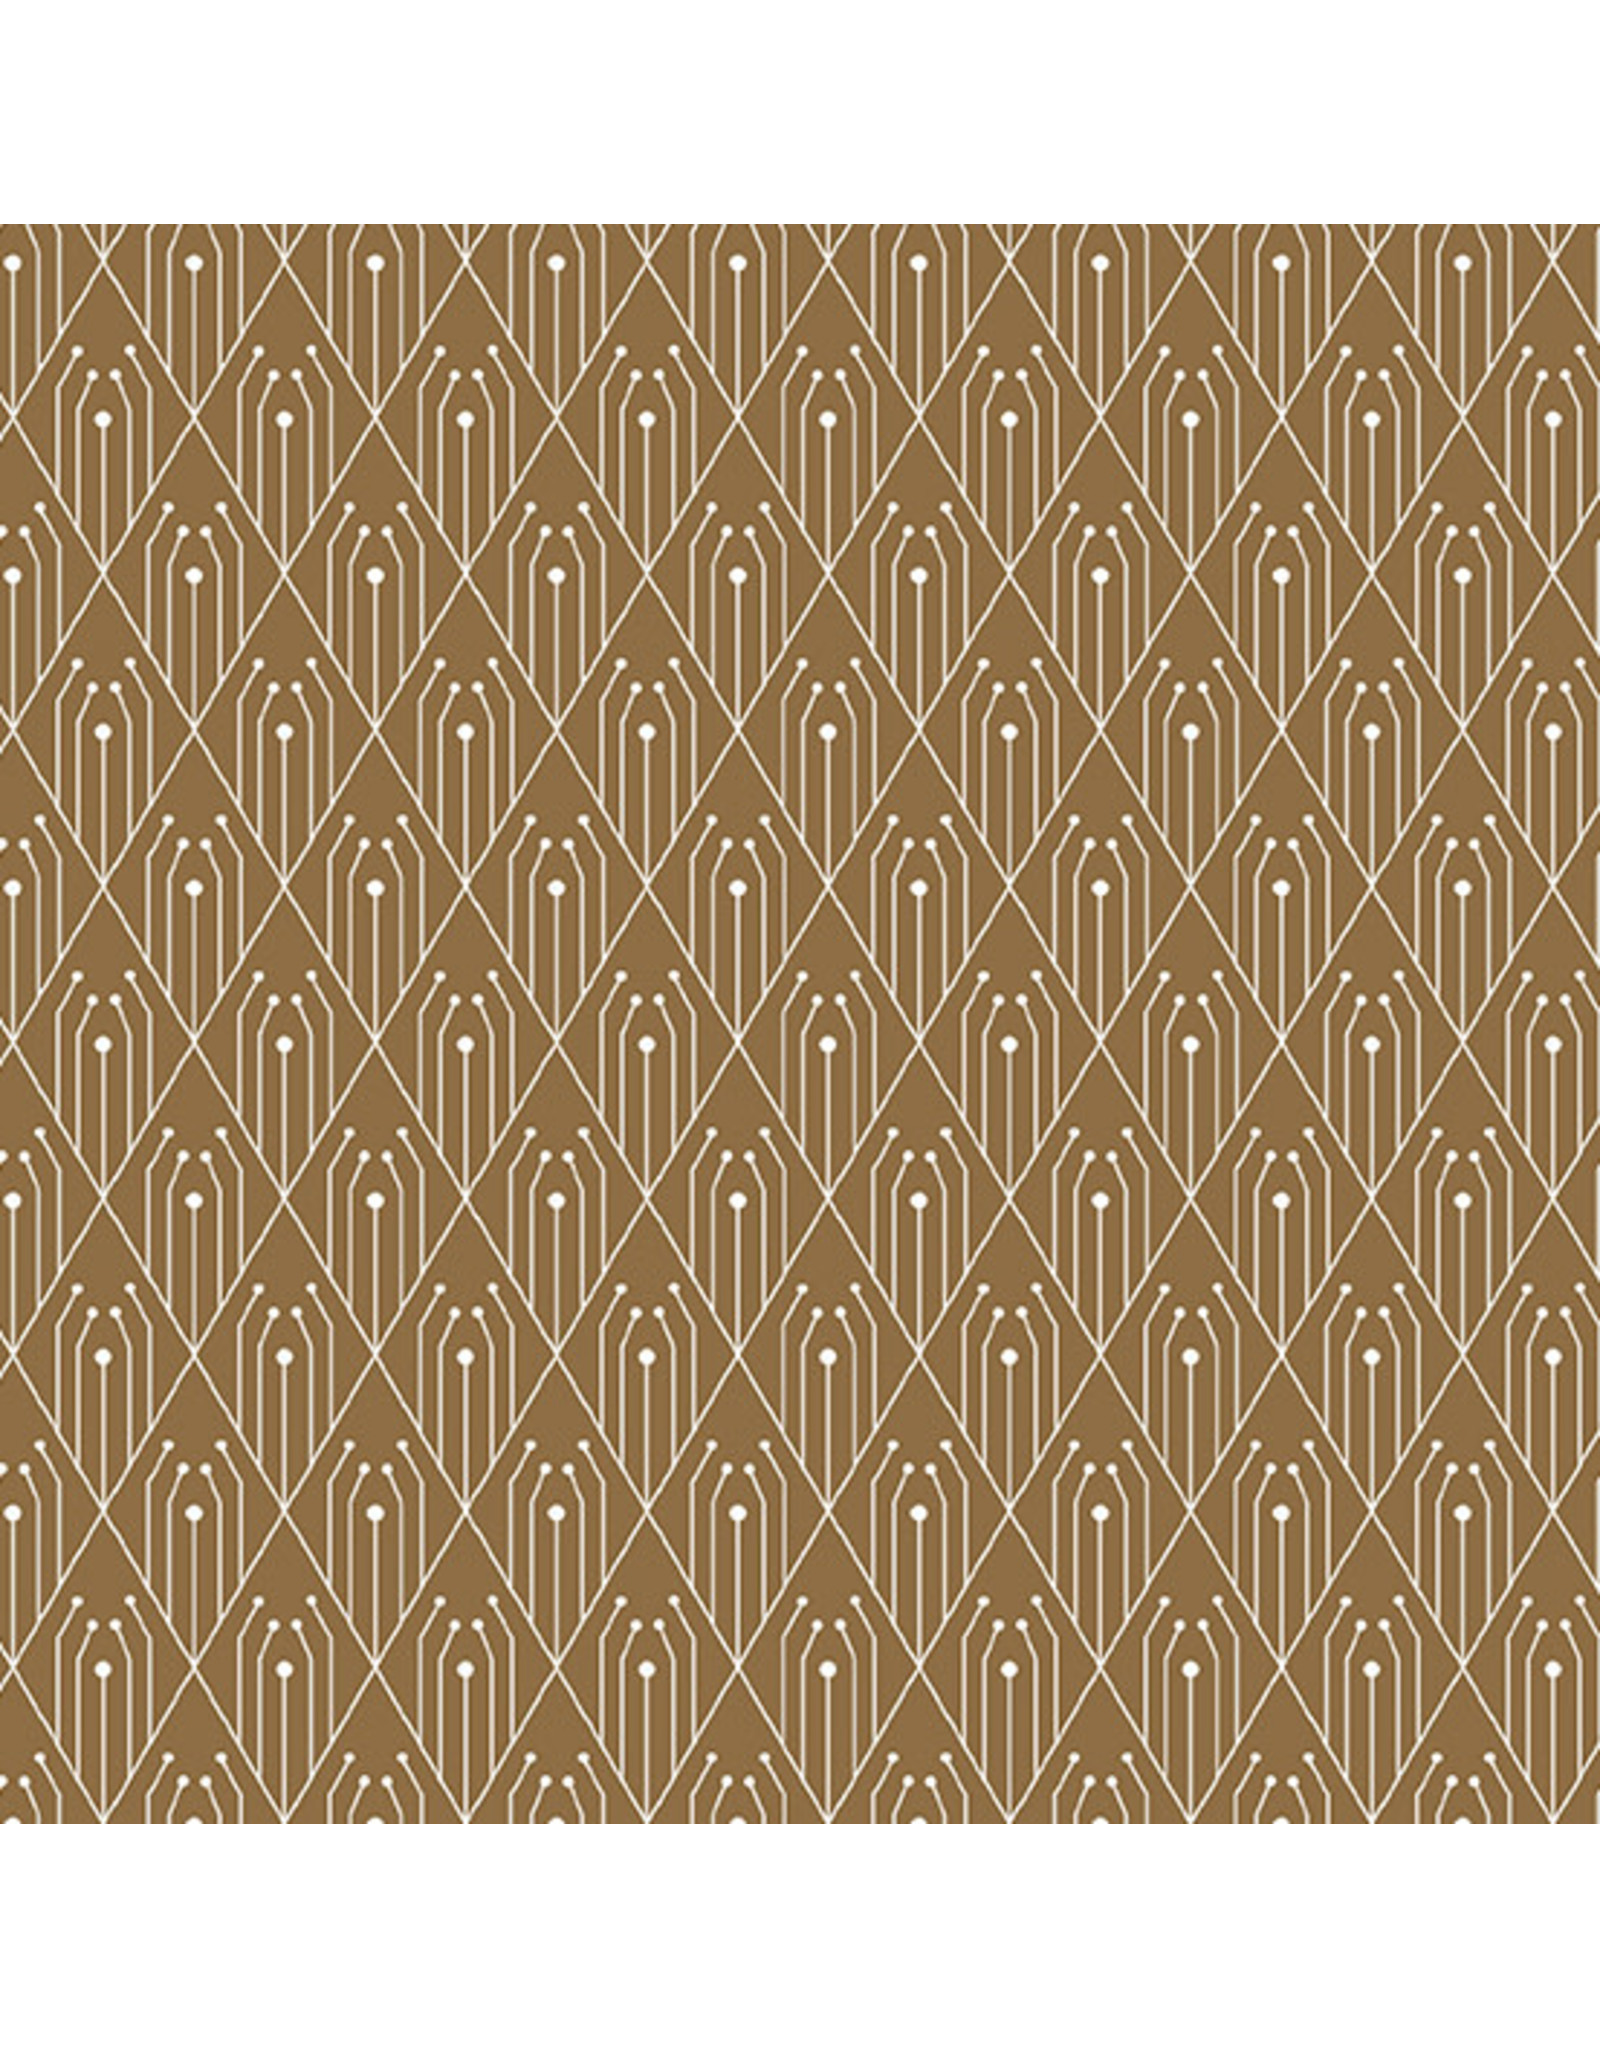 Giucy Giuce Century Prints, Deco Diamonds in Cinnamon, Fabric Half-Yards